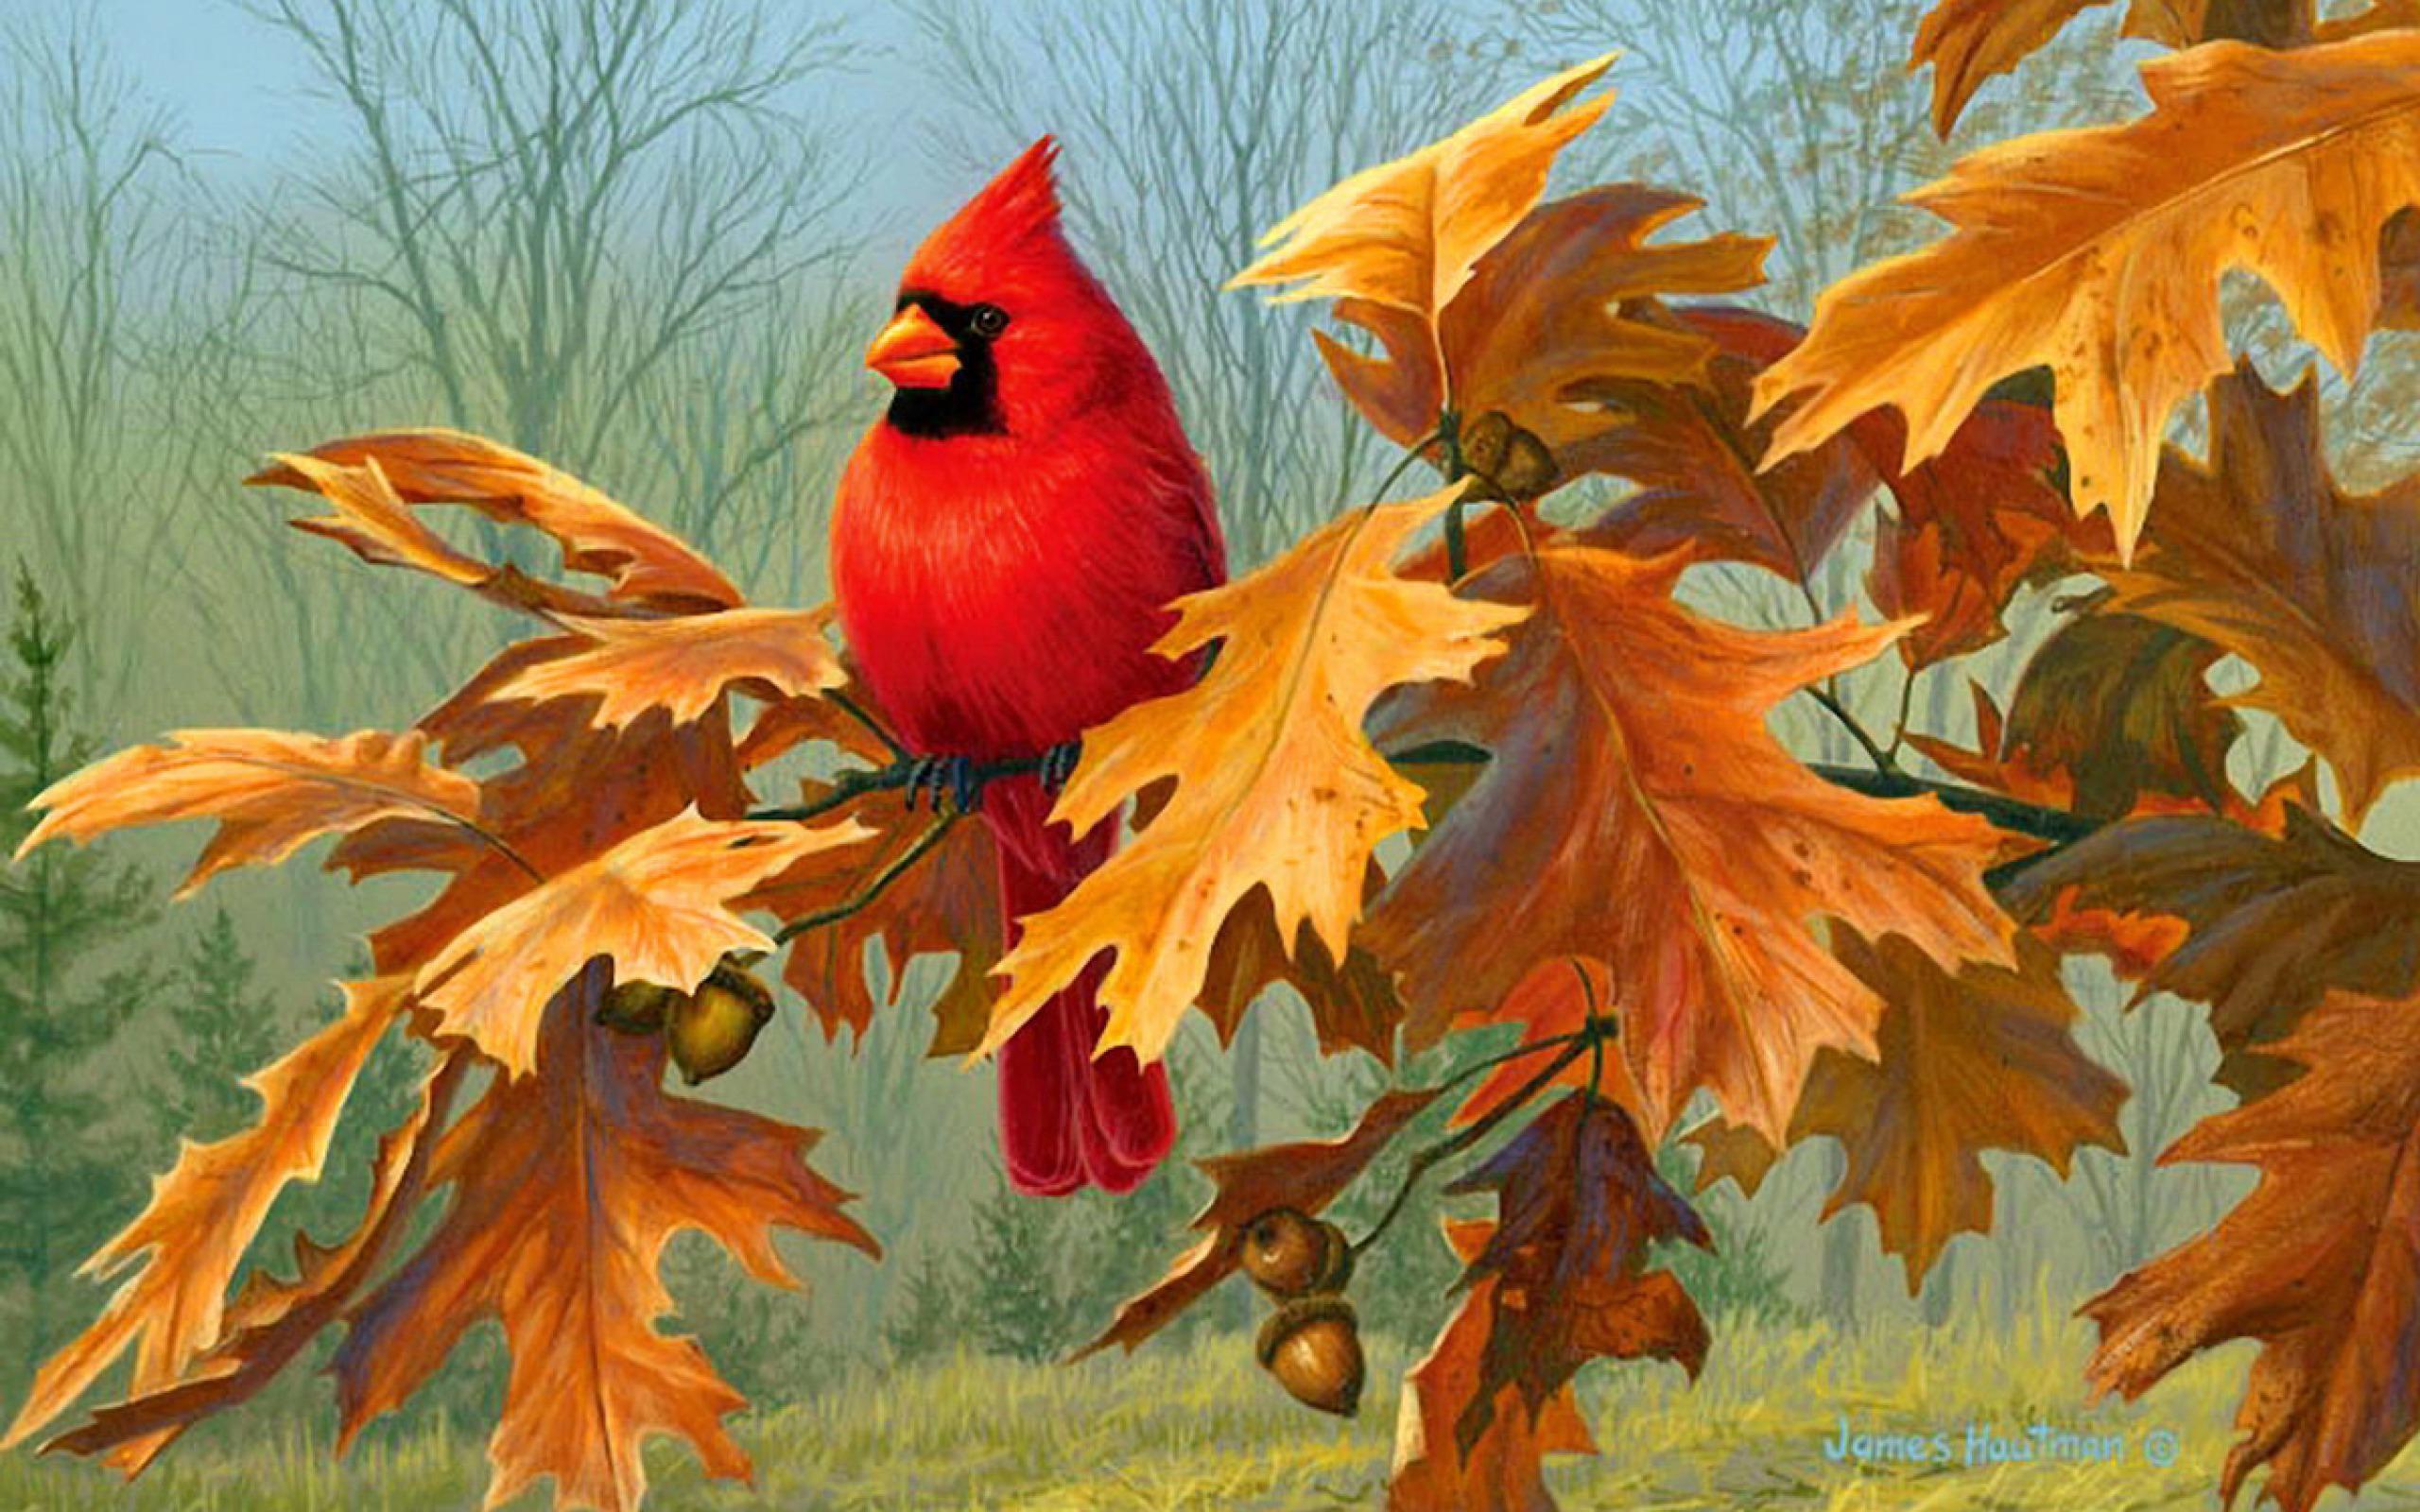 Hd Wallpaper Fall Leaf Change Cardinal Art Id 87634 Art Abyss